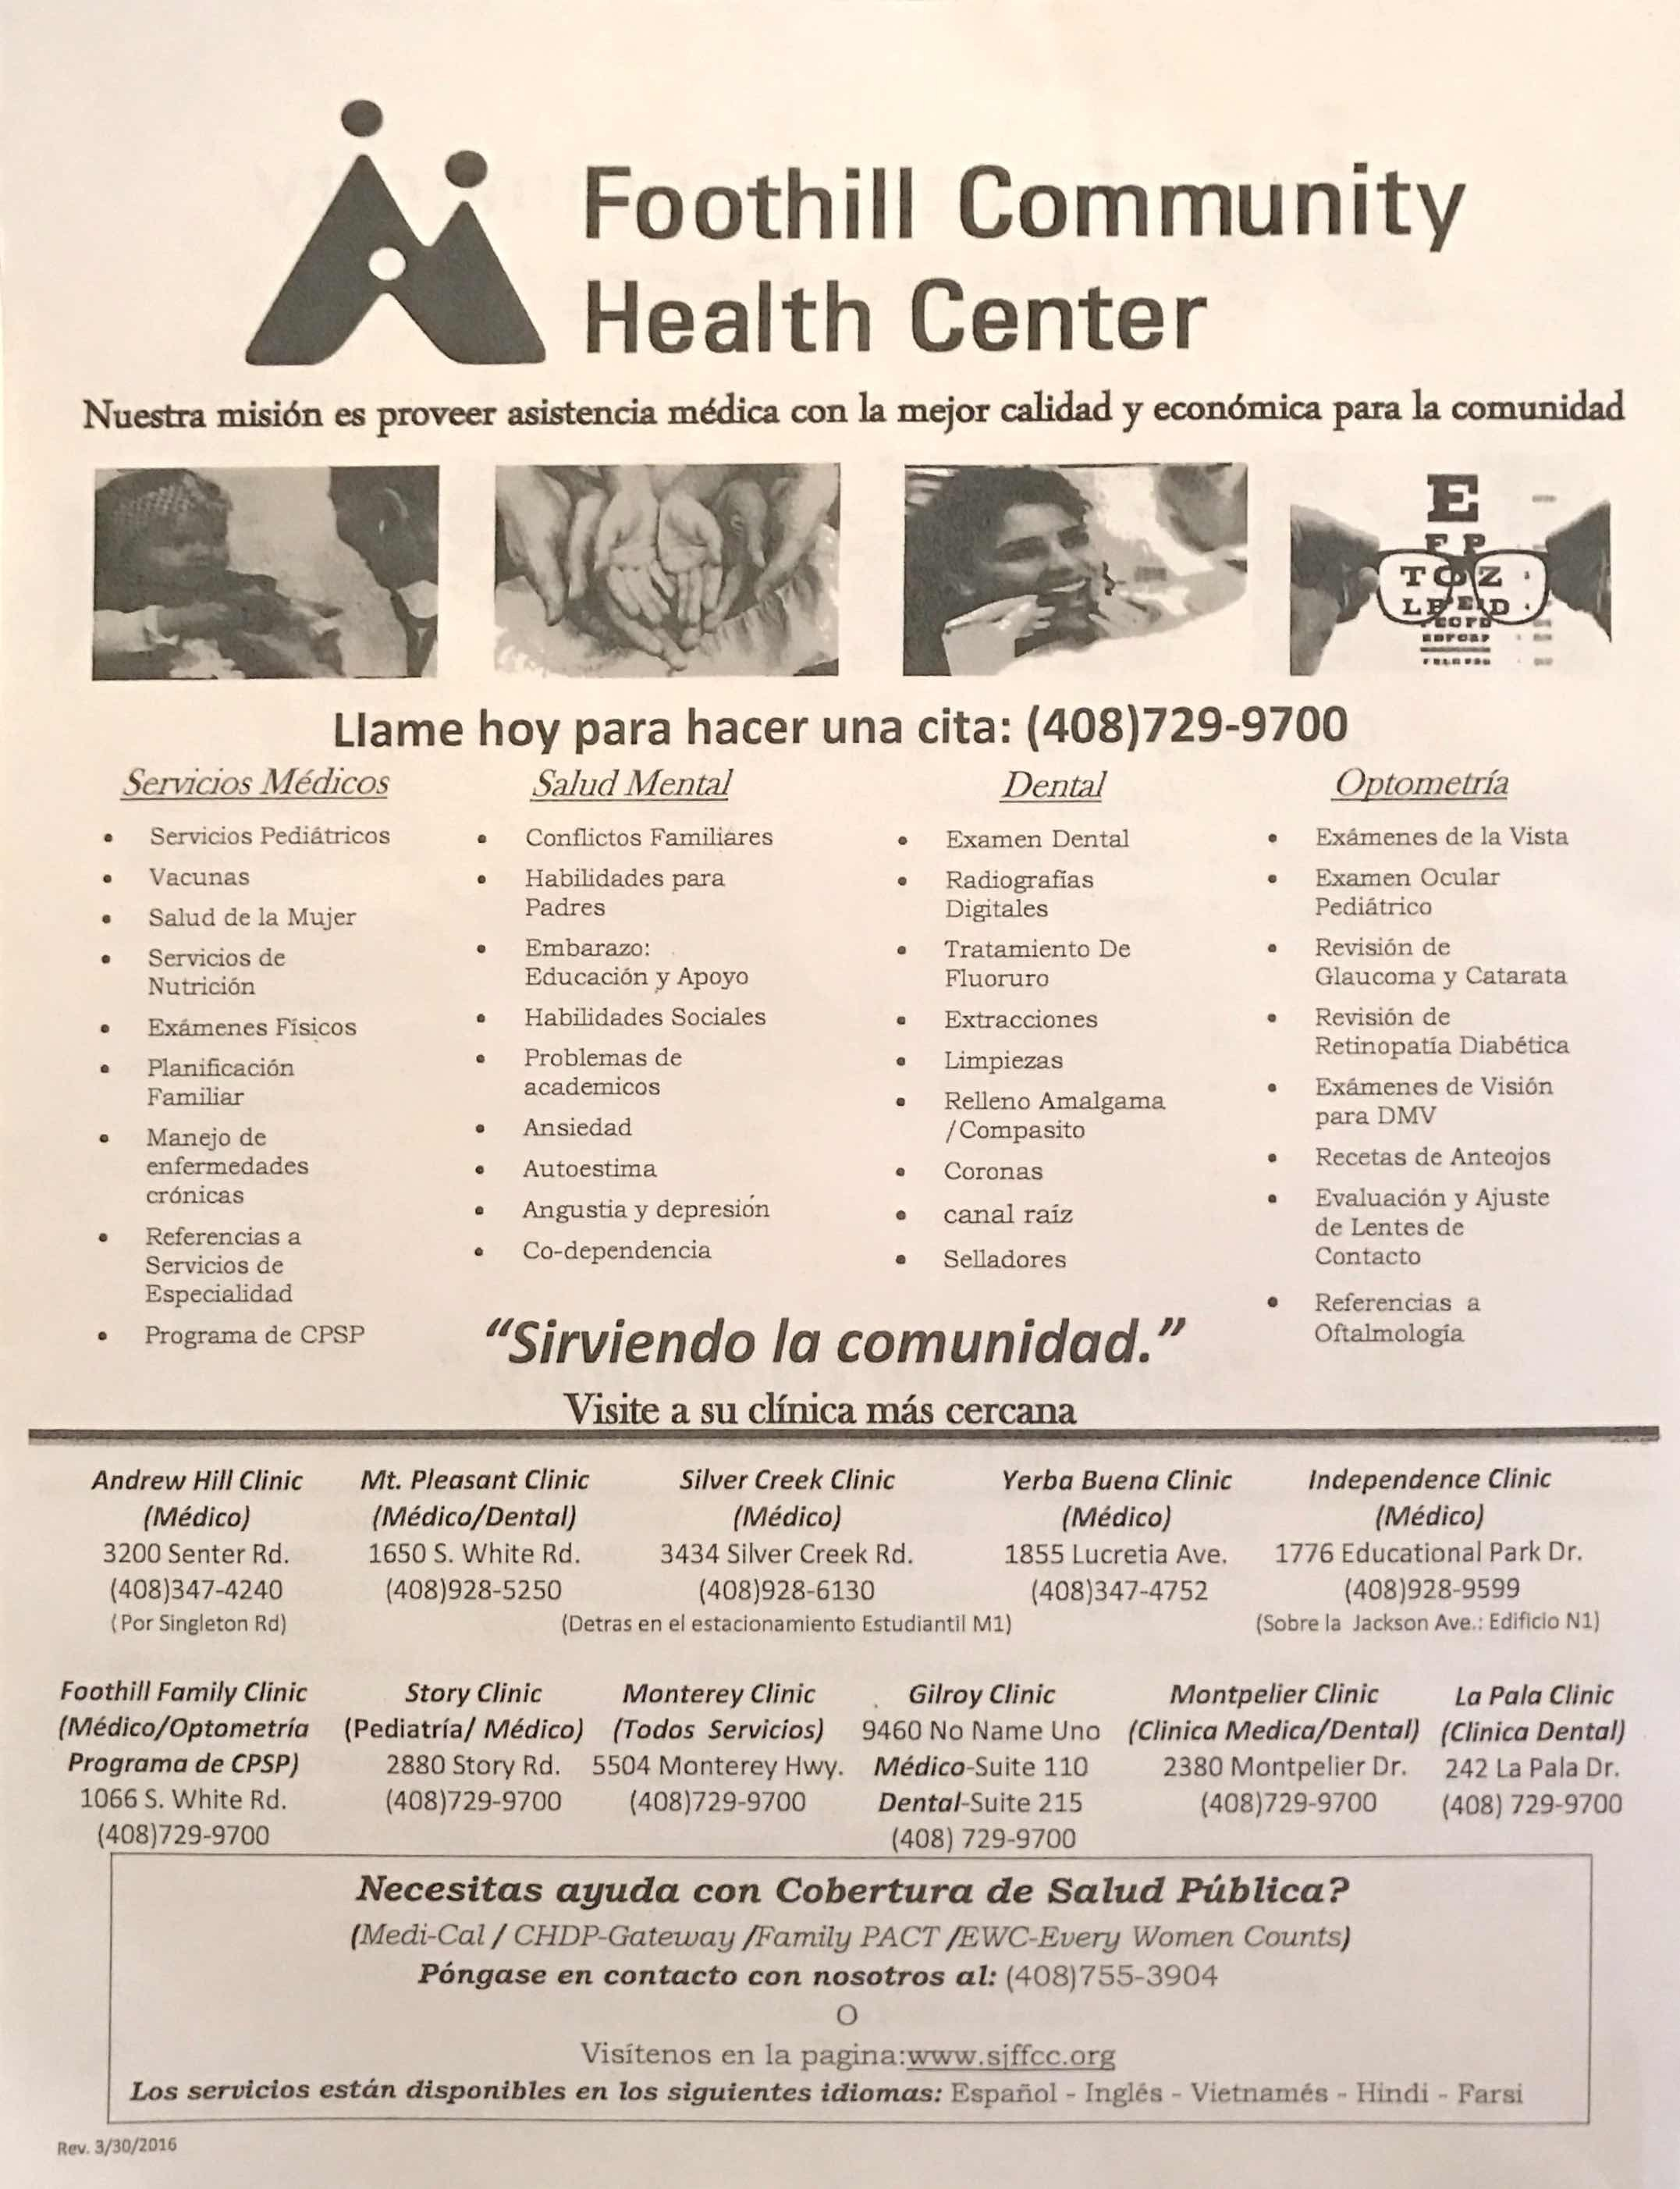 Foothill Community Health Center Flyer 2